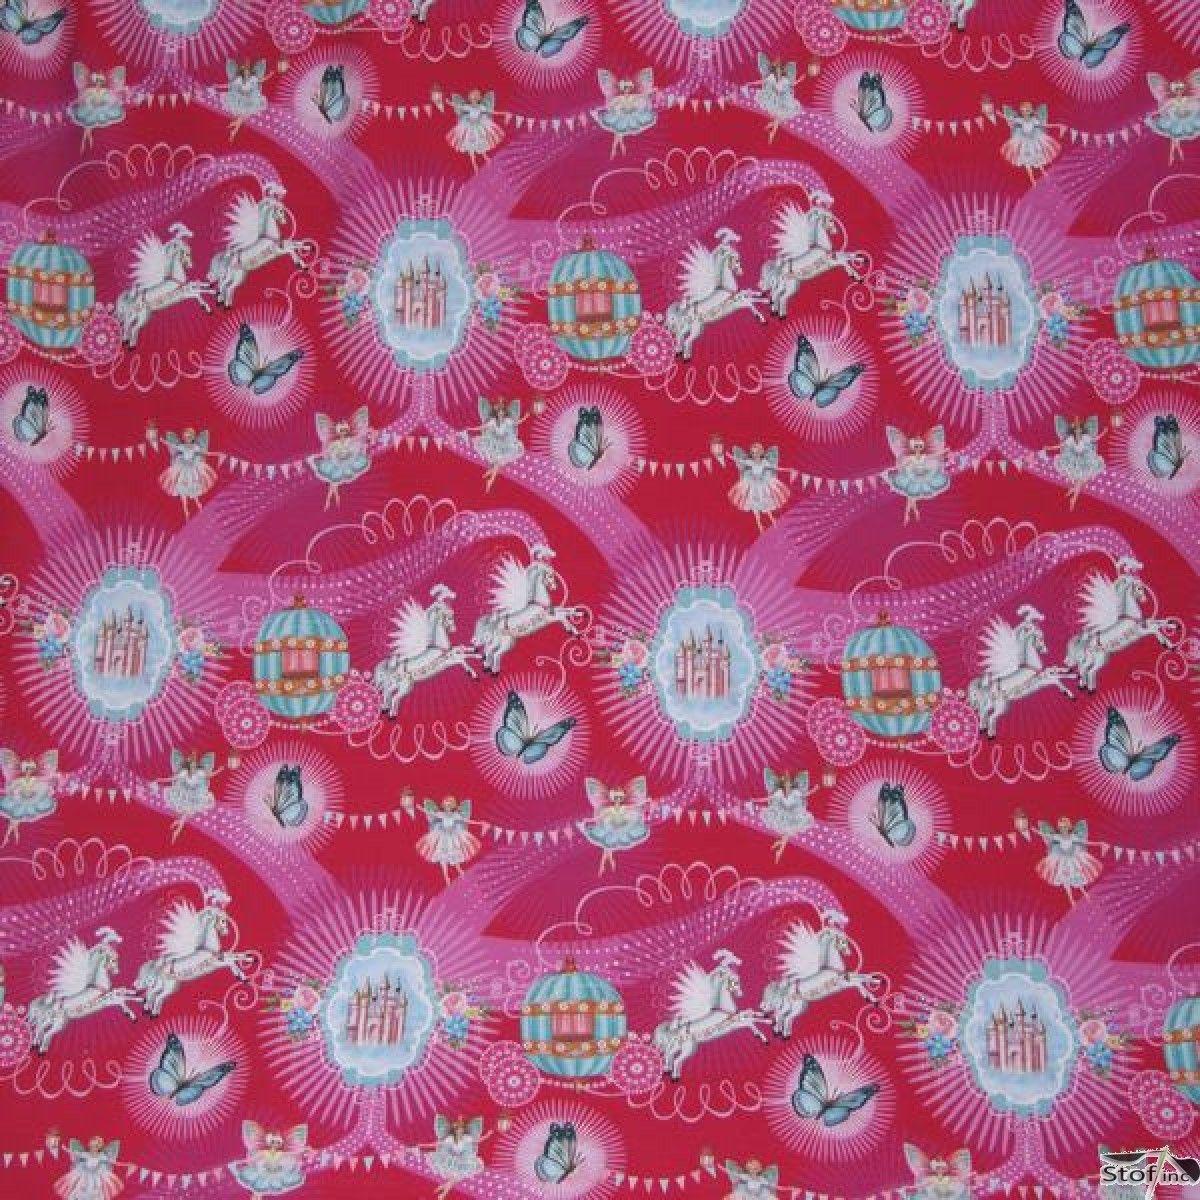 digitale tricot you will go to the ball by Fiona Hewitt mooie kwaliteit tricot met een ontwerp van Fiona Hewitt 96%co 4%ea 155 breed 200gr m2